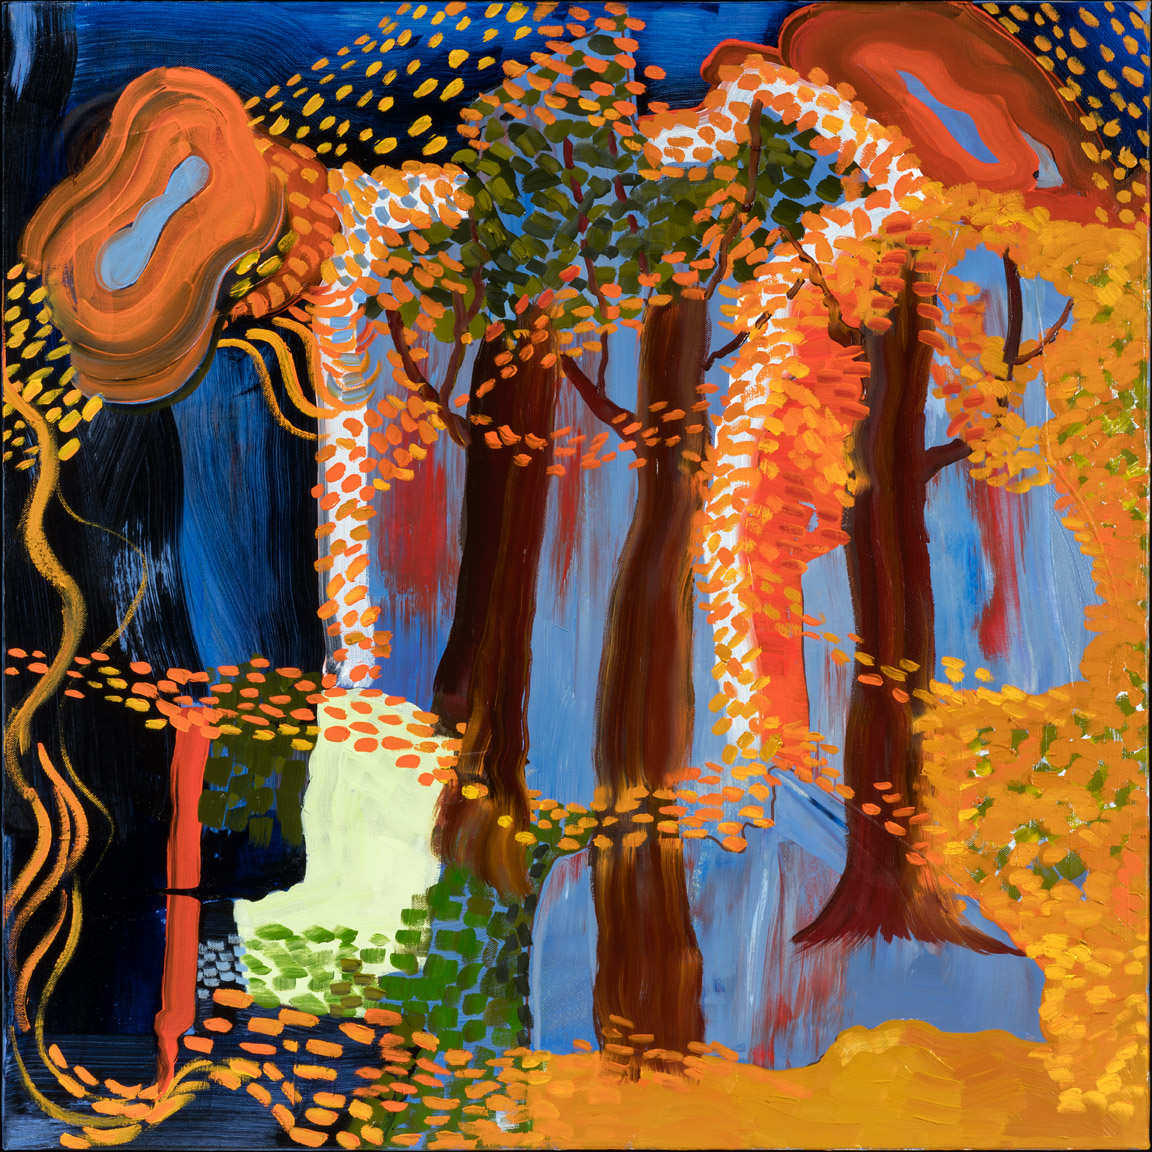 Autumn Splendor - oil acrylic painting by Artist Irwin E Thompson